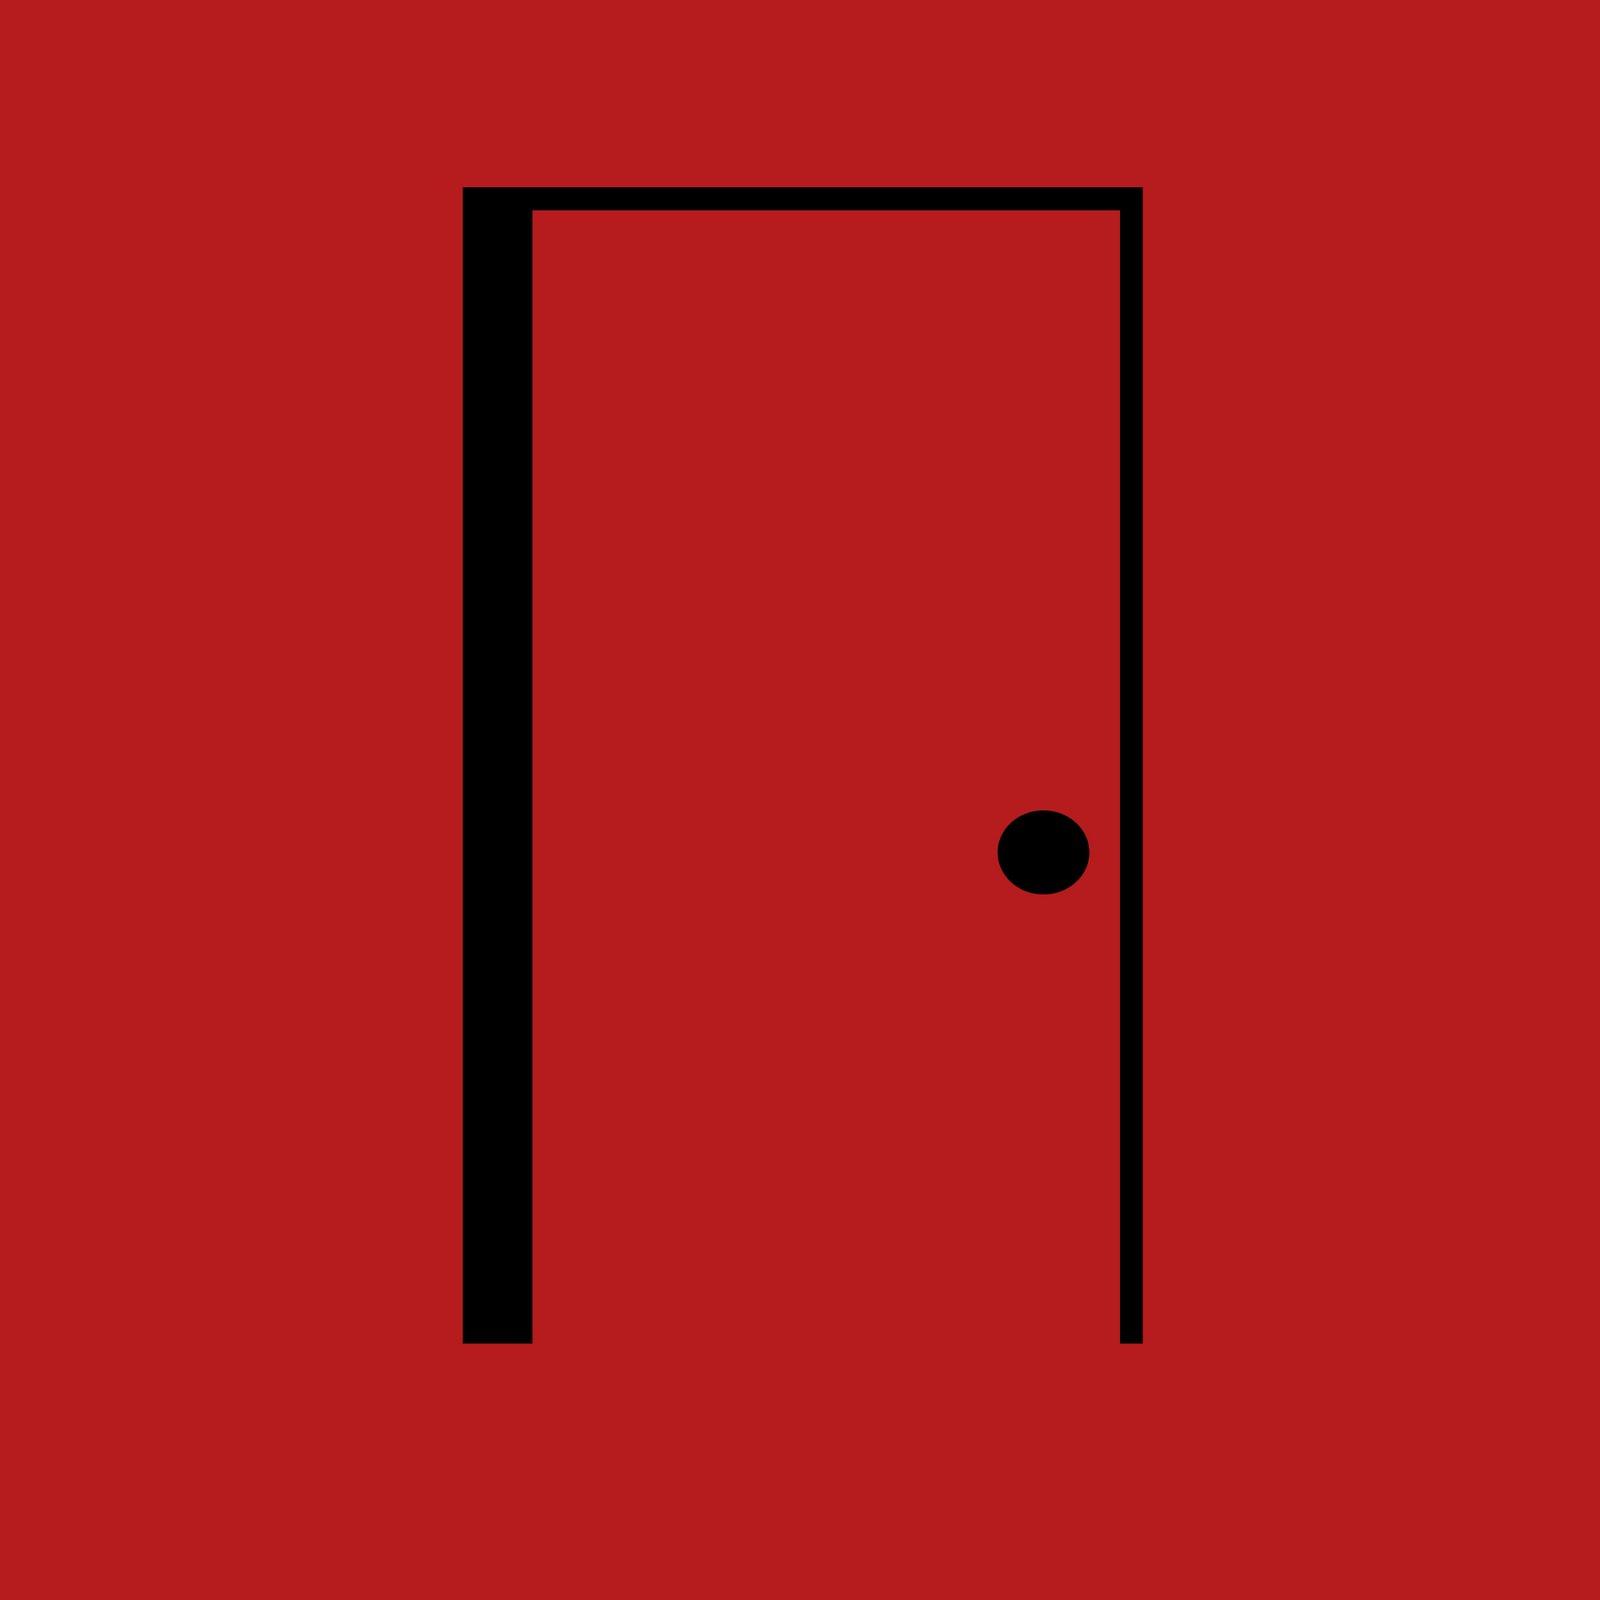 http://1.bp.blogspot.com/-q7koc2d_Vfk/TfGHMijLFbI/AAAAAAAABa8/Qg2EJl0o454/s1600/Closed_Door.jpg